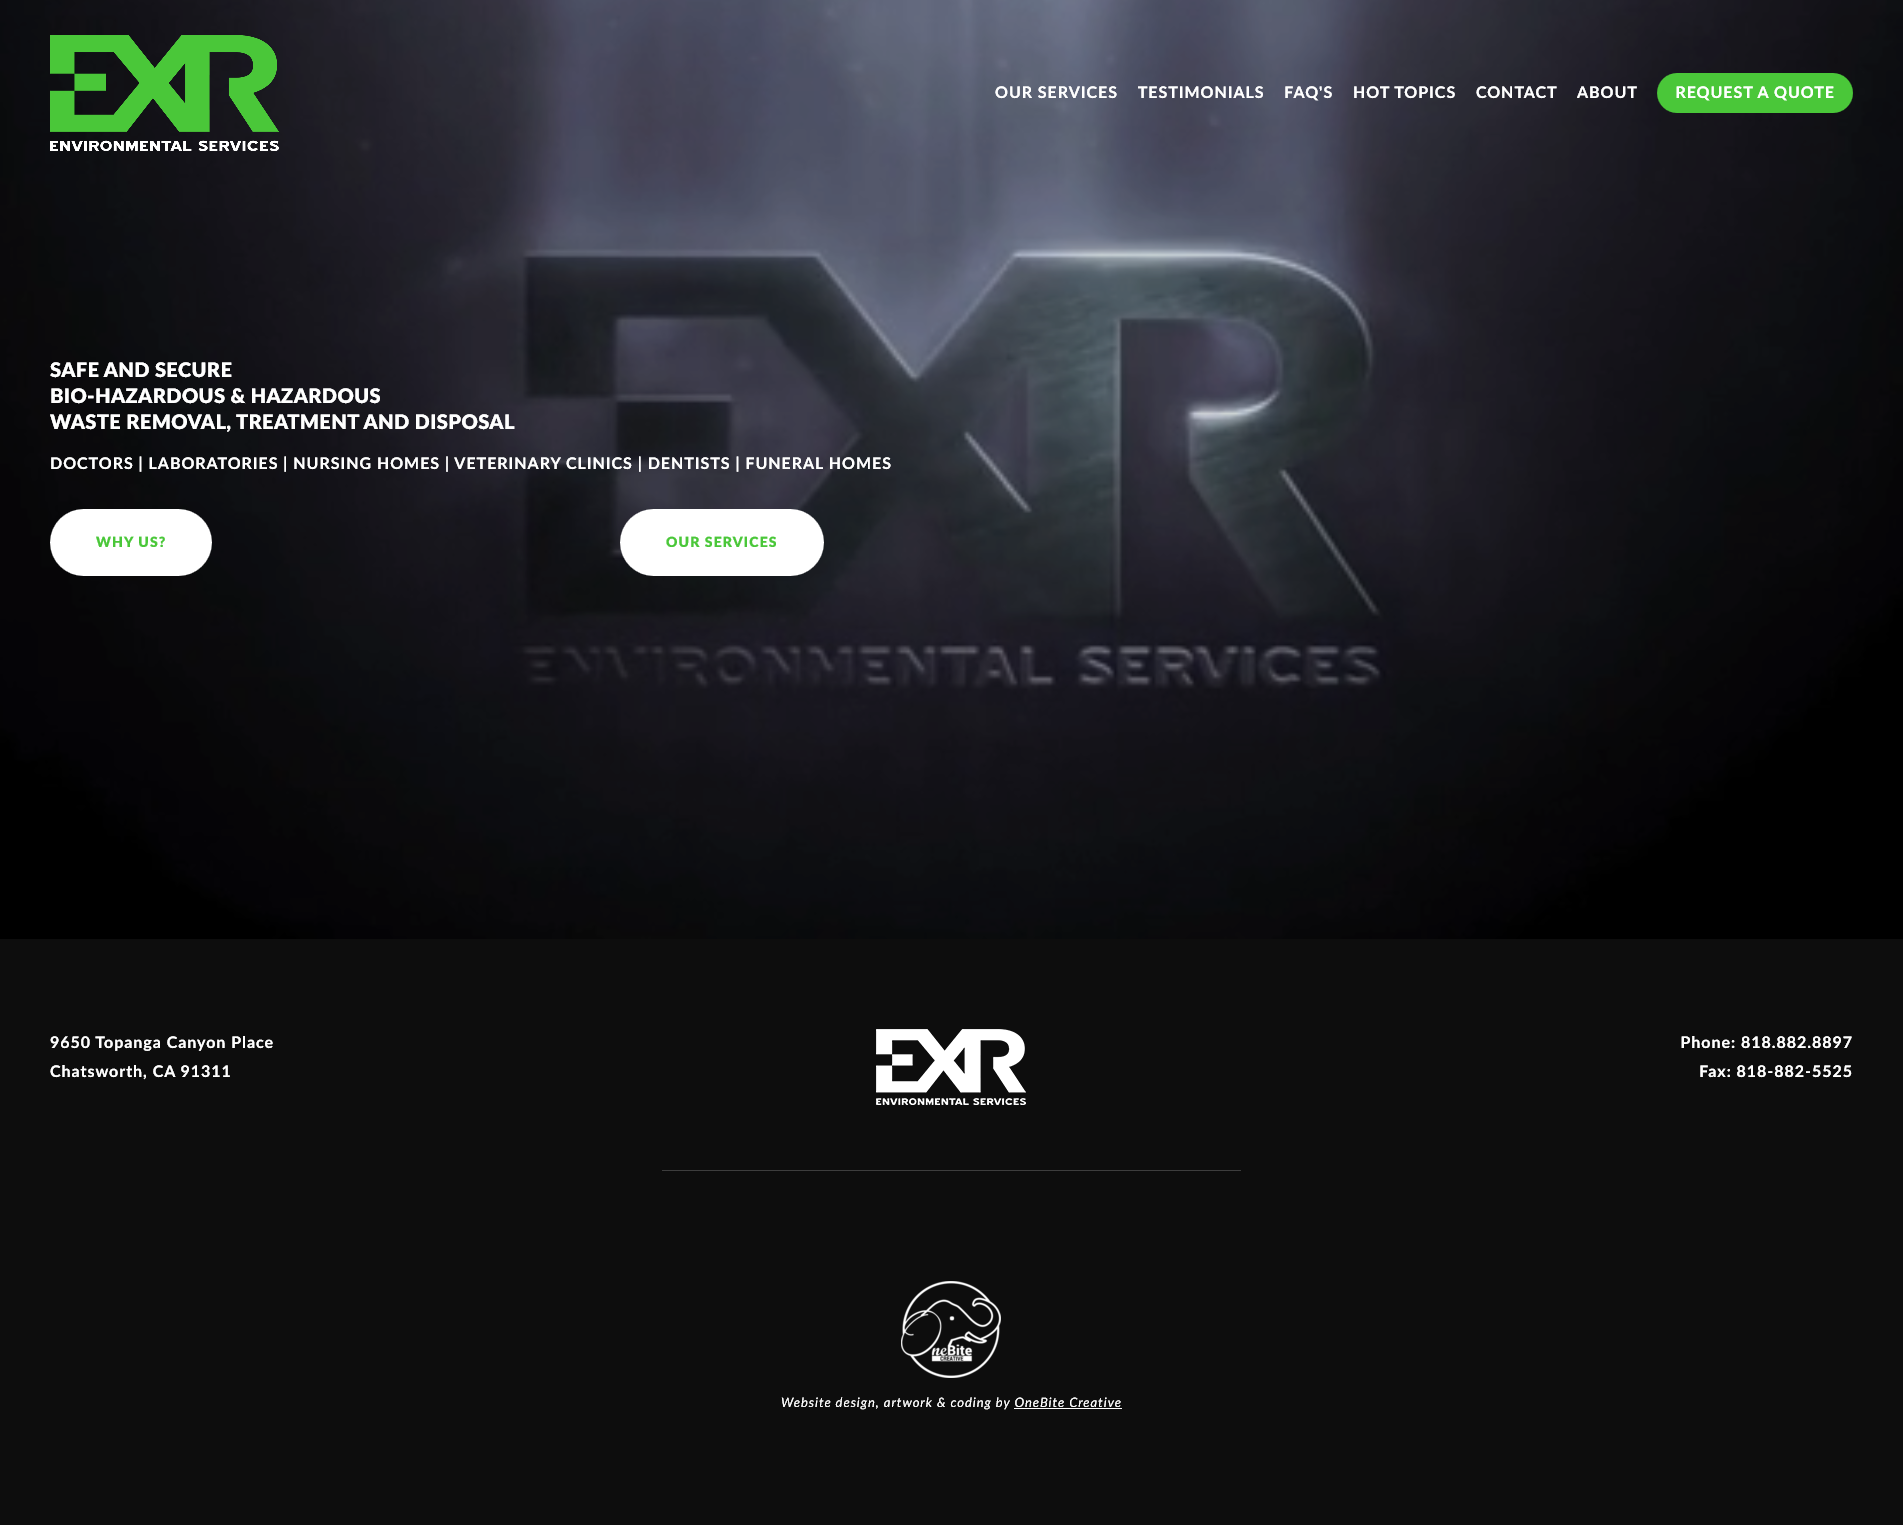 THE NEW EXR WEBSITE